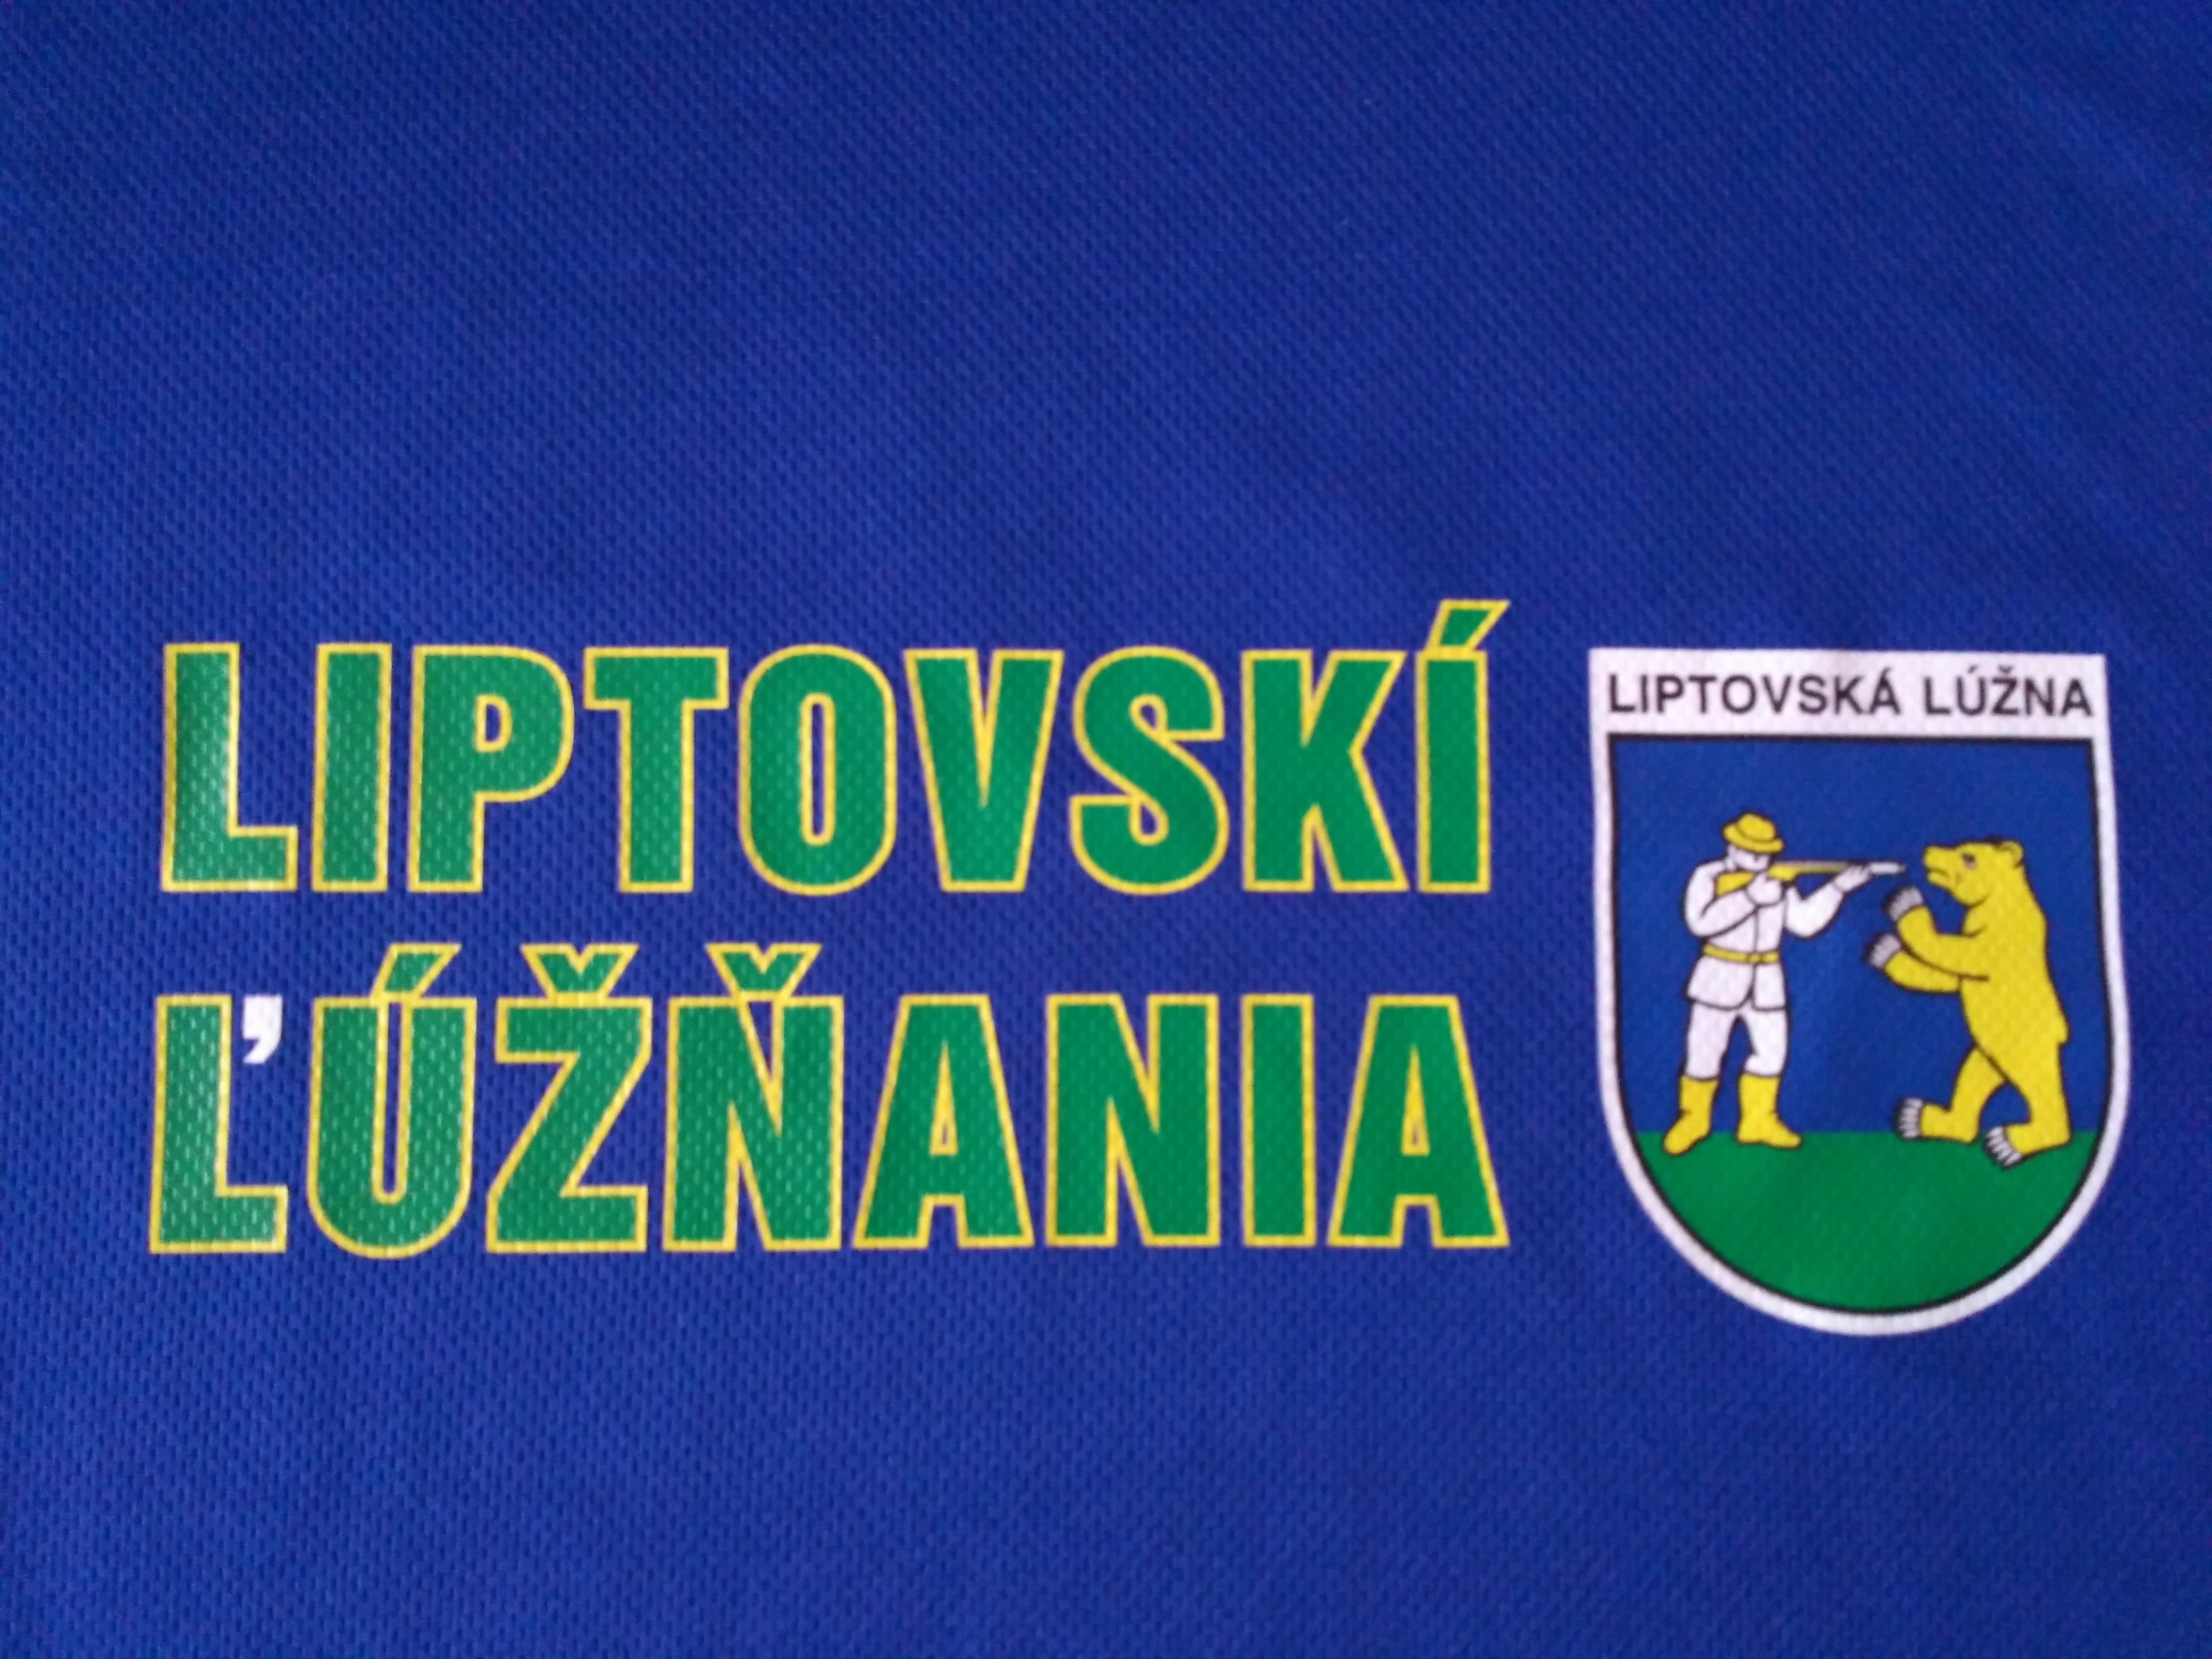 /images/com_odtatierkdunaju/teams/2019_Liptovsk---------nania.jpg